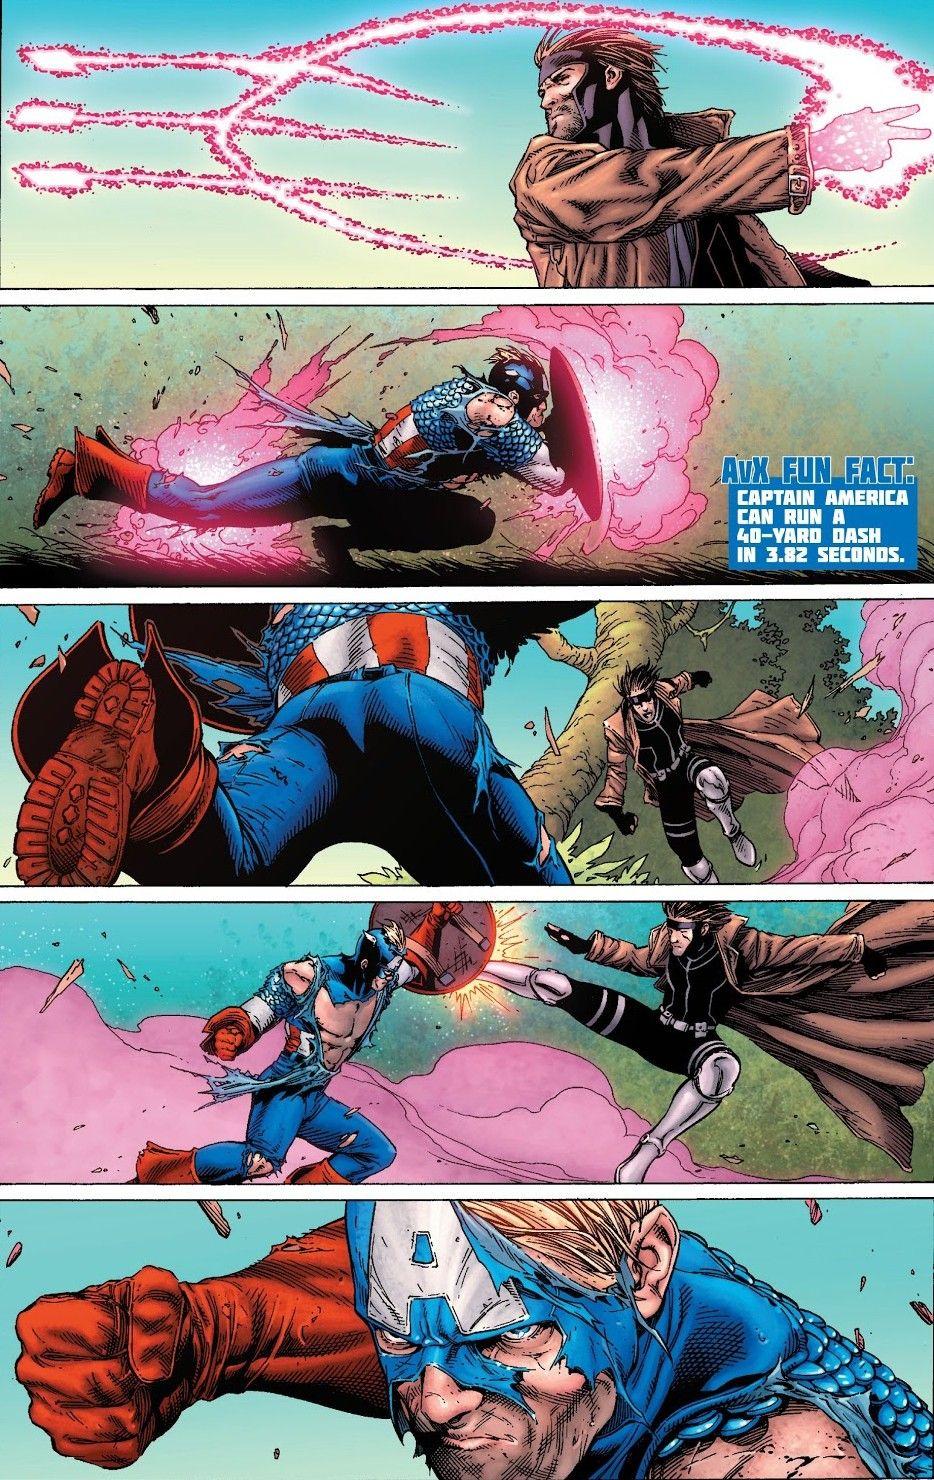 Gambit Vs Captain America Avx Vs 2 Marvel Comic Character Gambit Marvel Superhero Comic